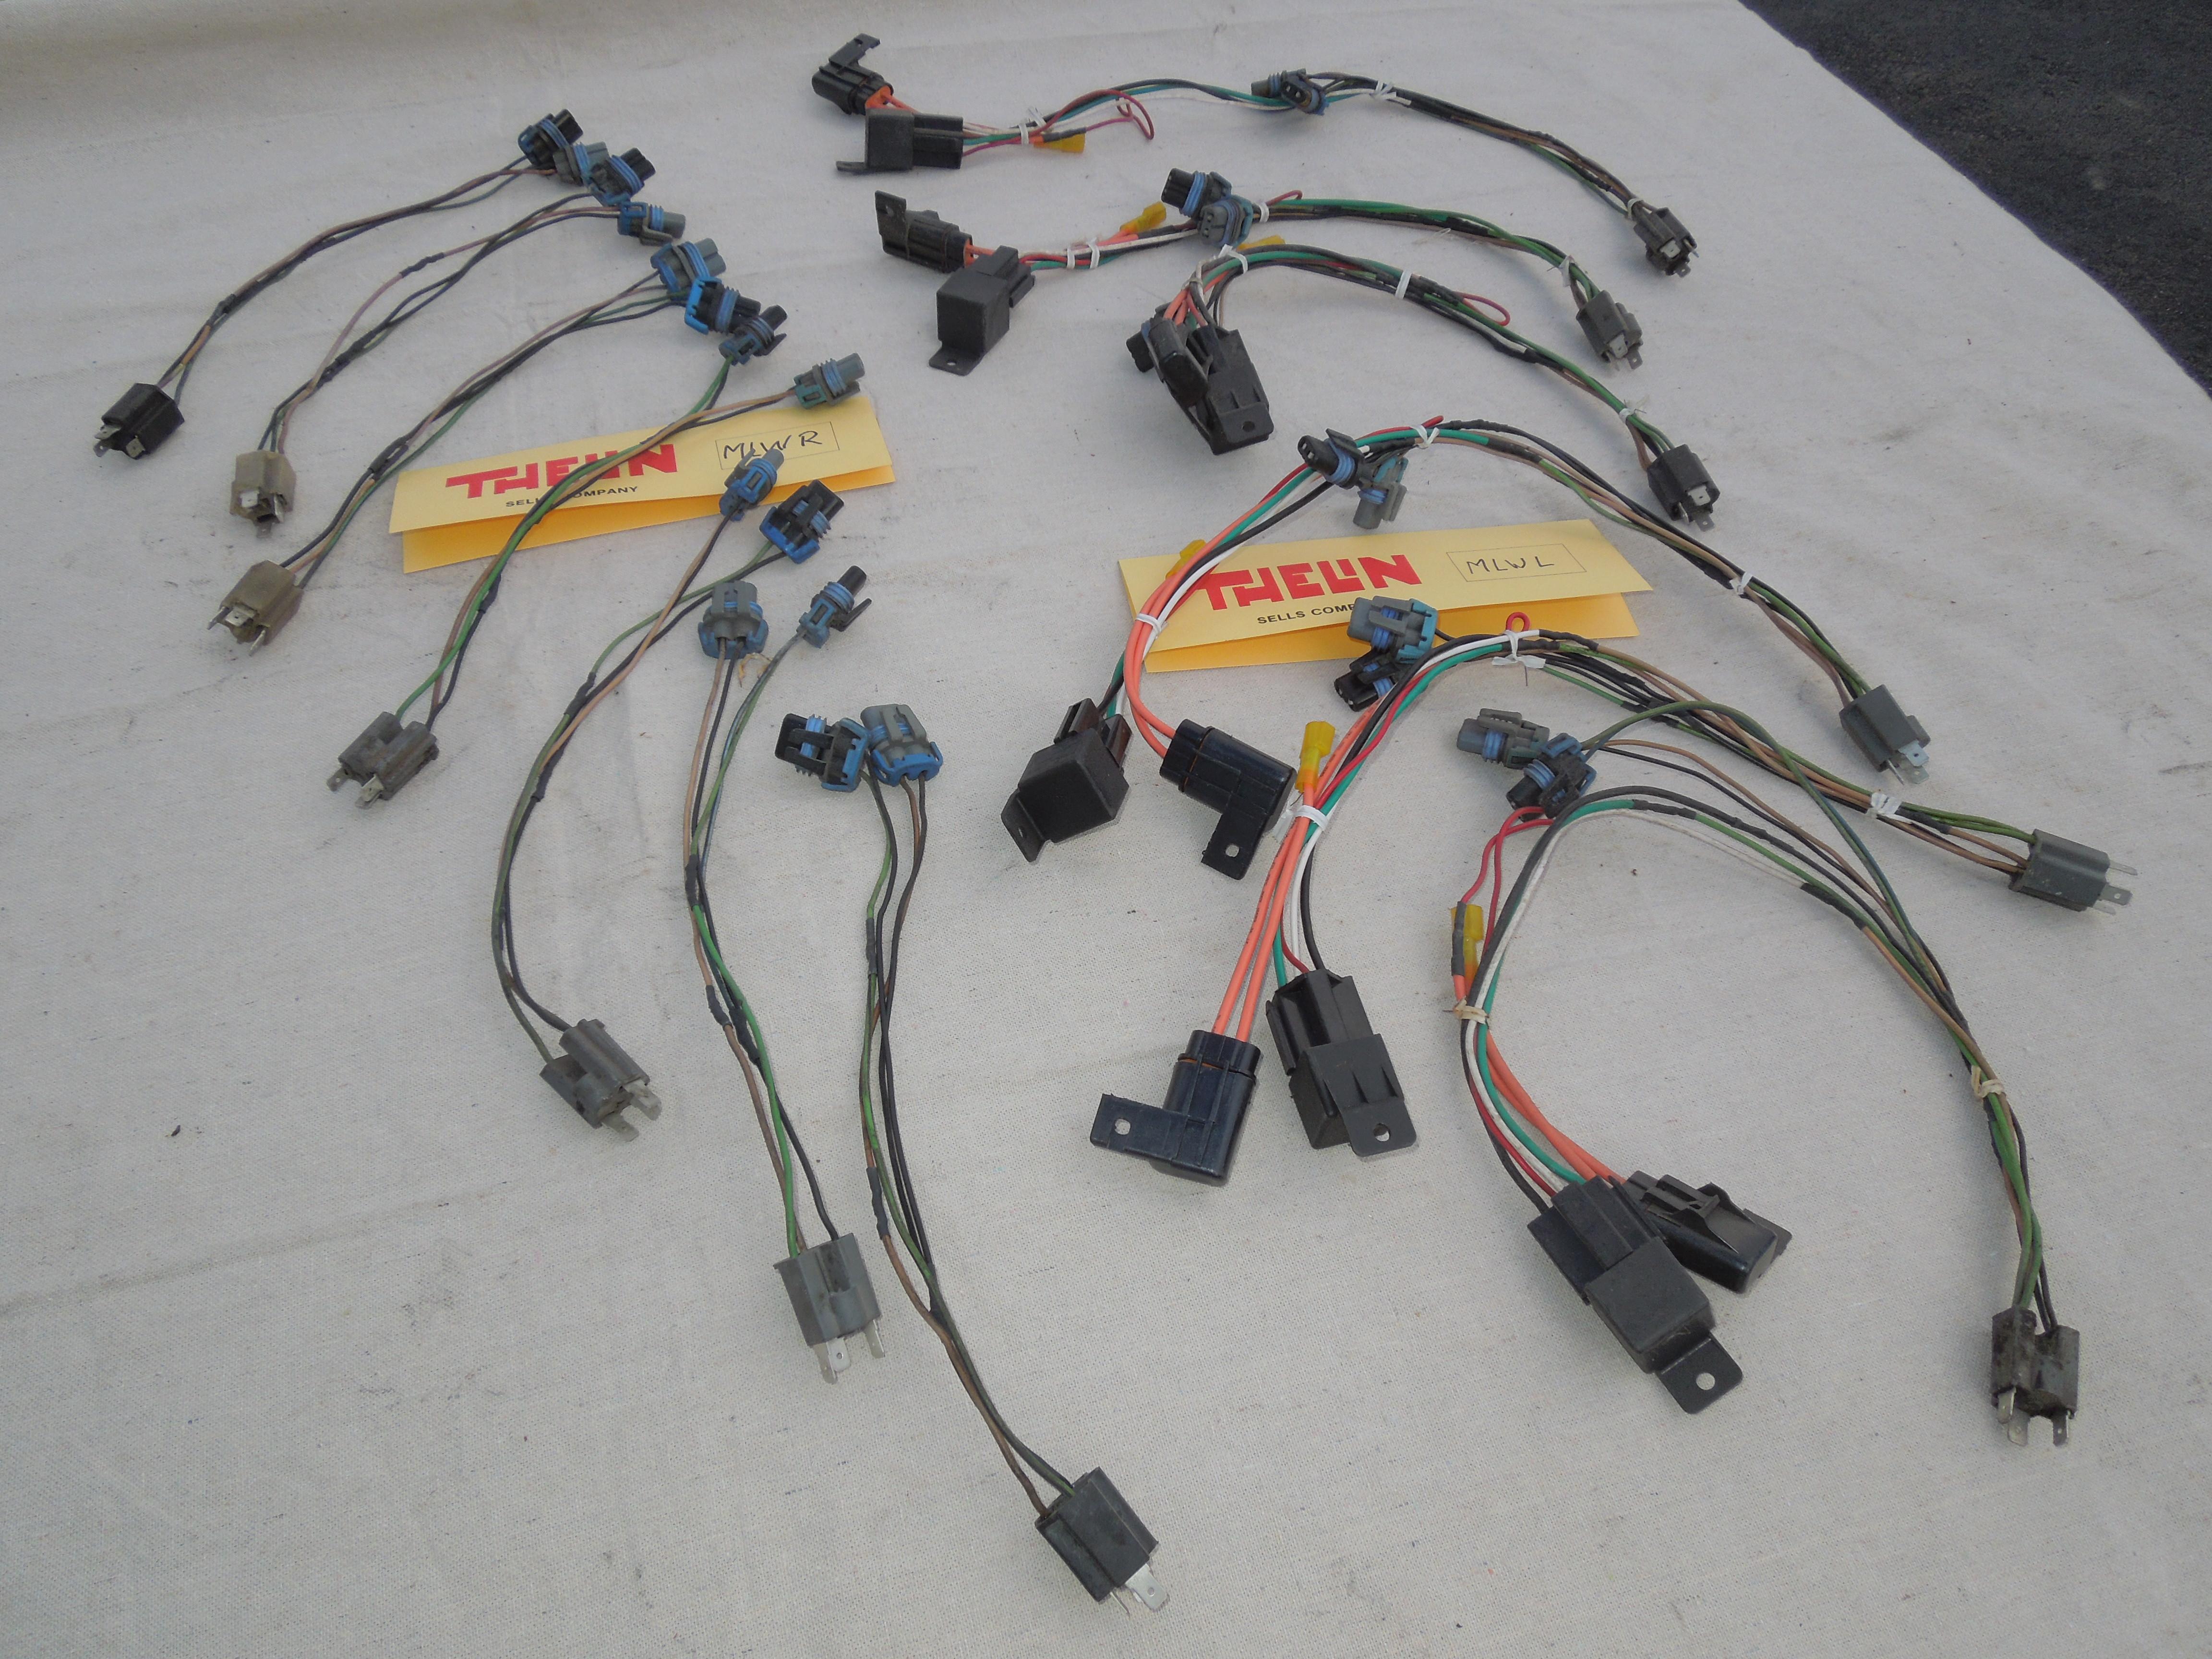 Sel Wire Harness Wiring Library Sportsman 500 Efi Diagram Polaris Needed Thelinsells Fiero Munson Left Mlwl 2500